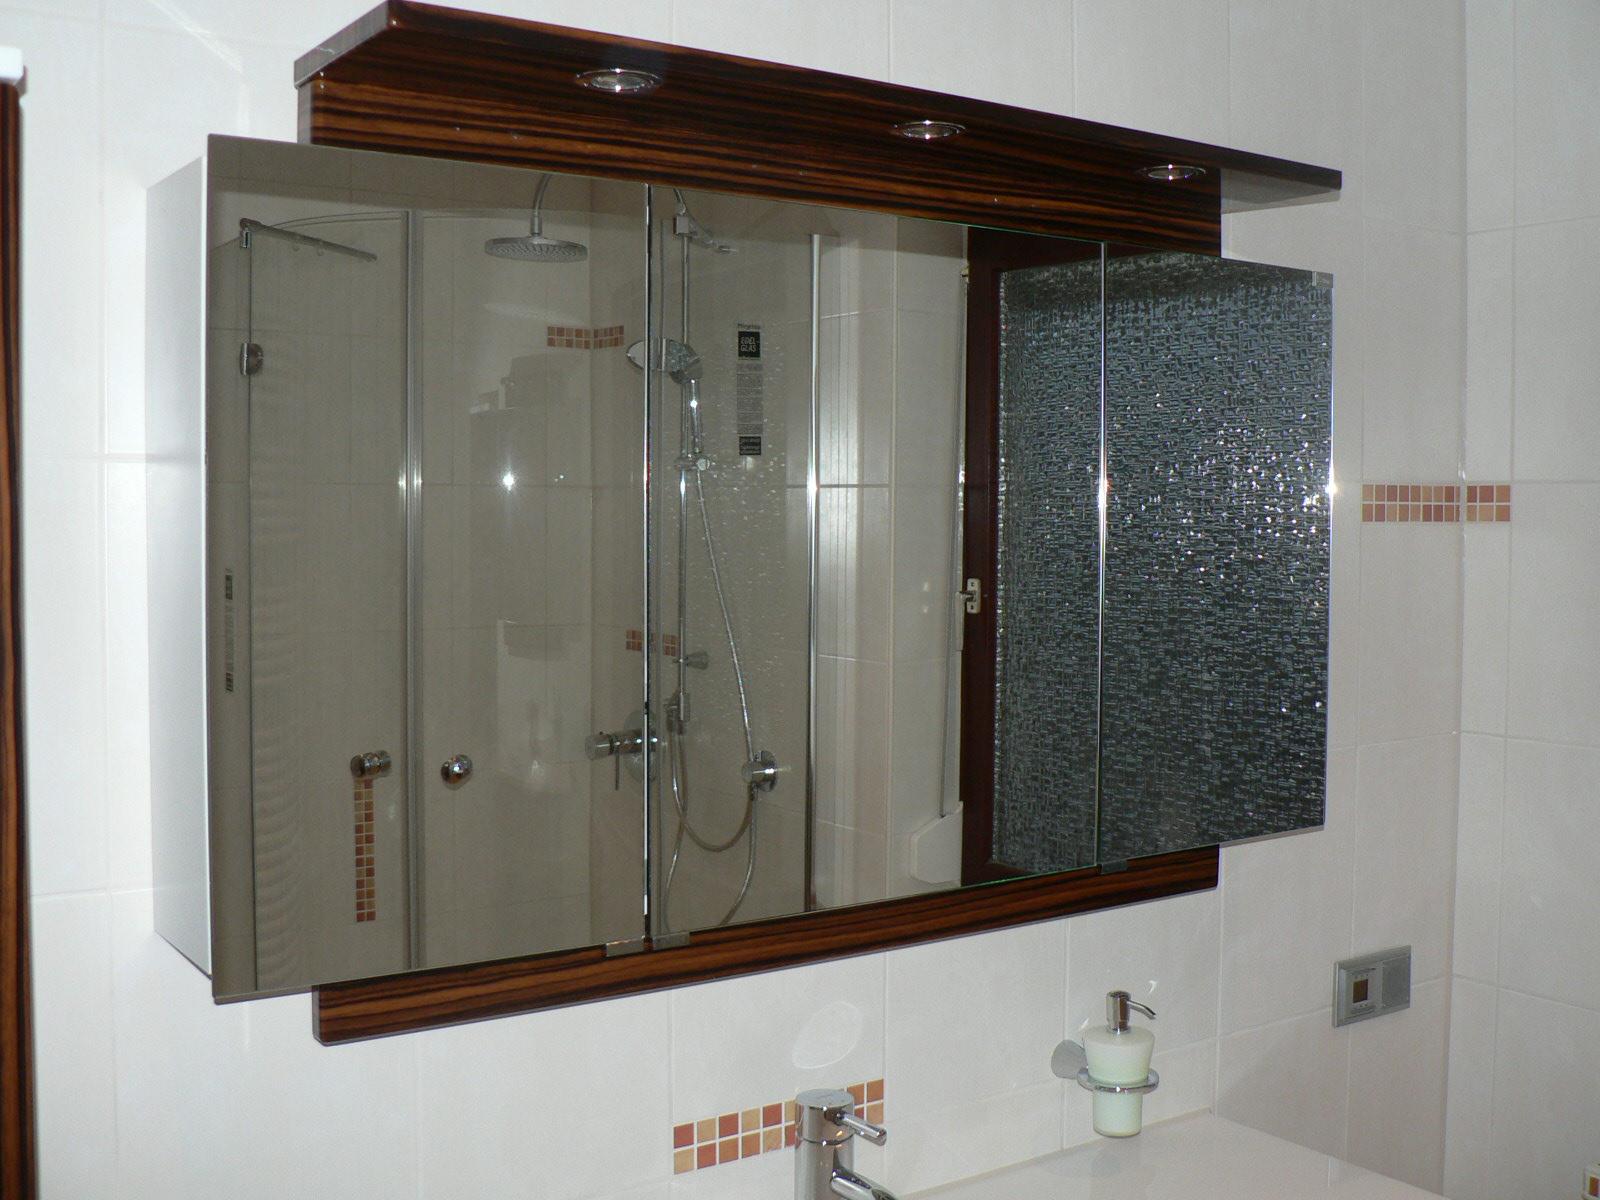 Gerd Nolte Heizung & Sanitär – Badezimmer 17 Spiegelschrank